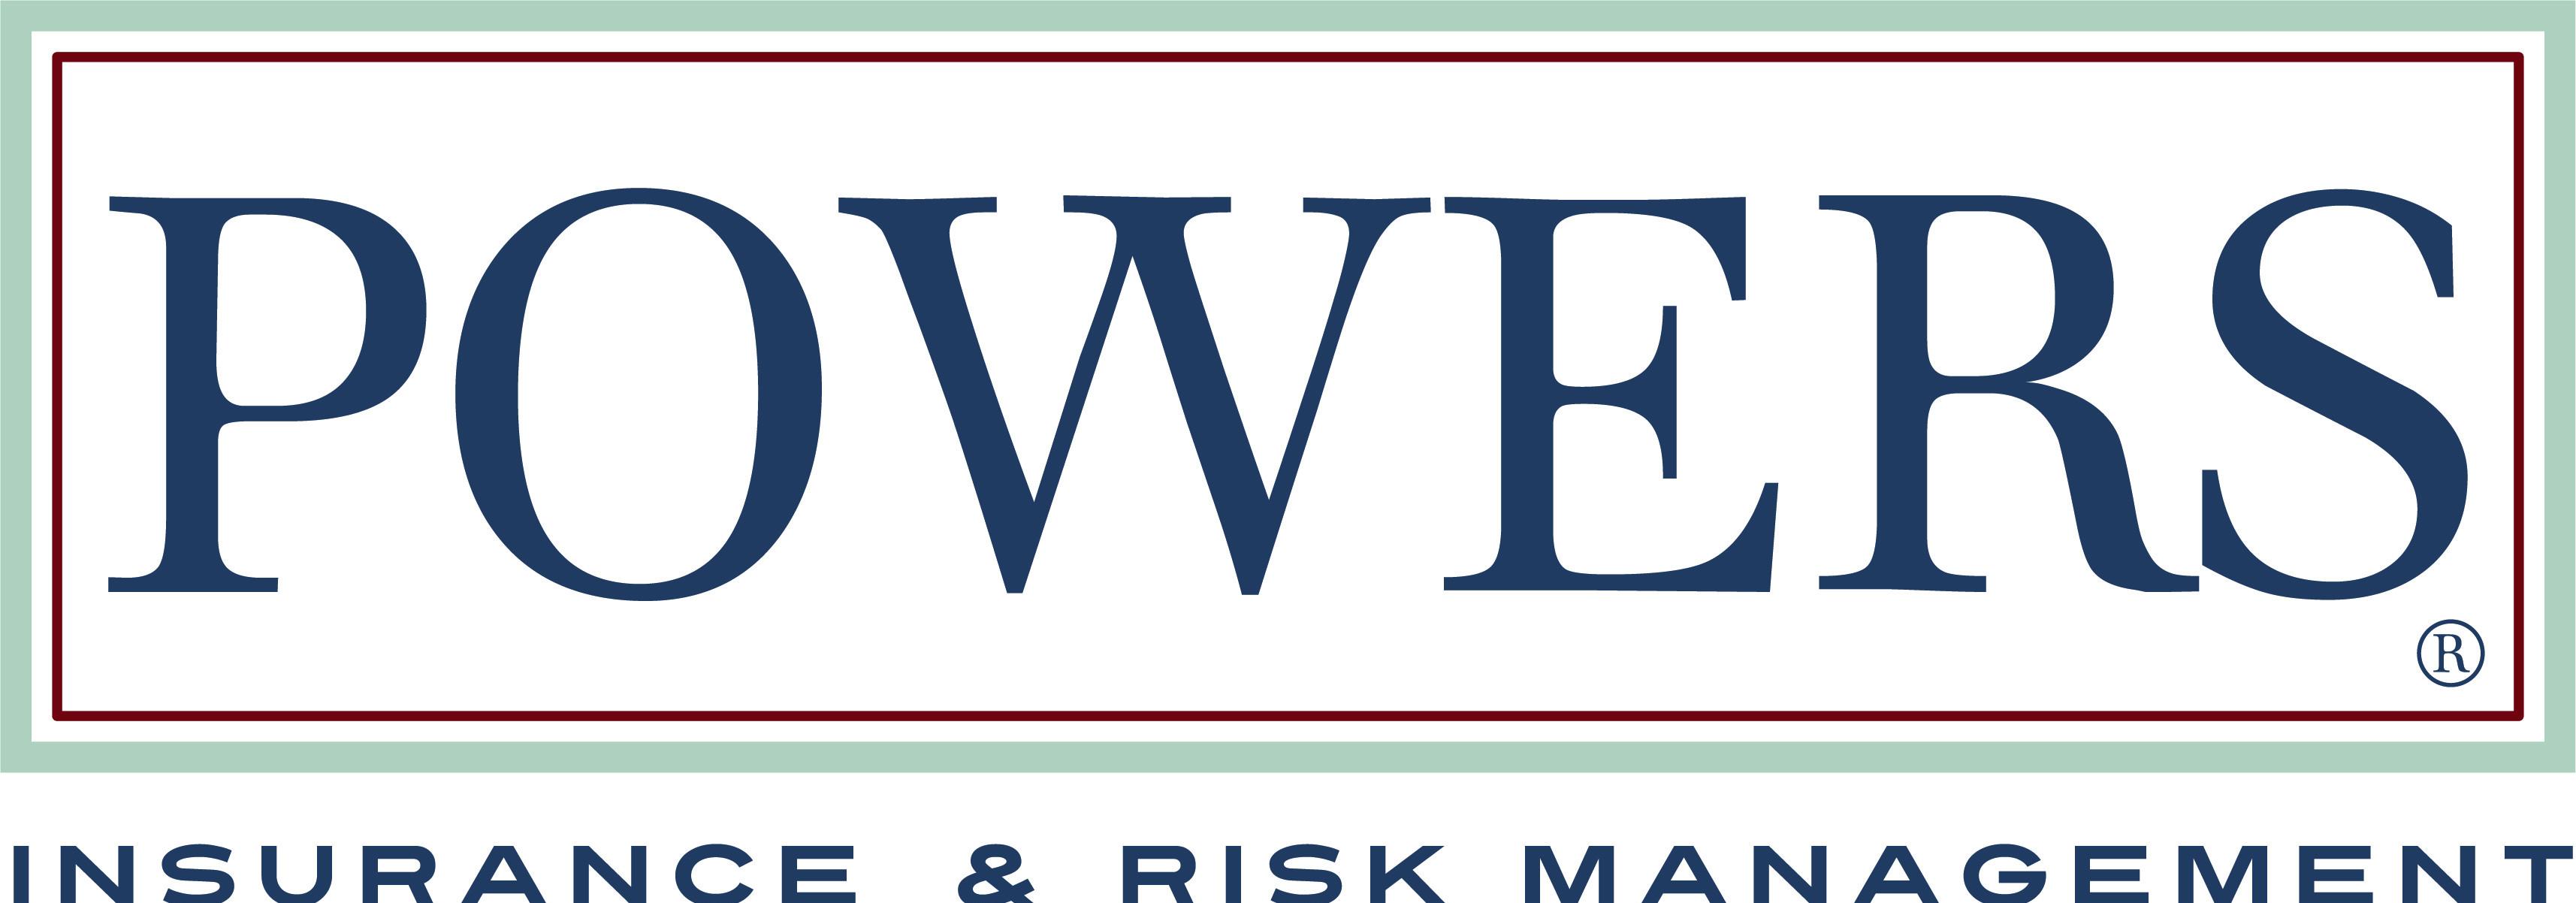 Powers Insurance